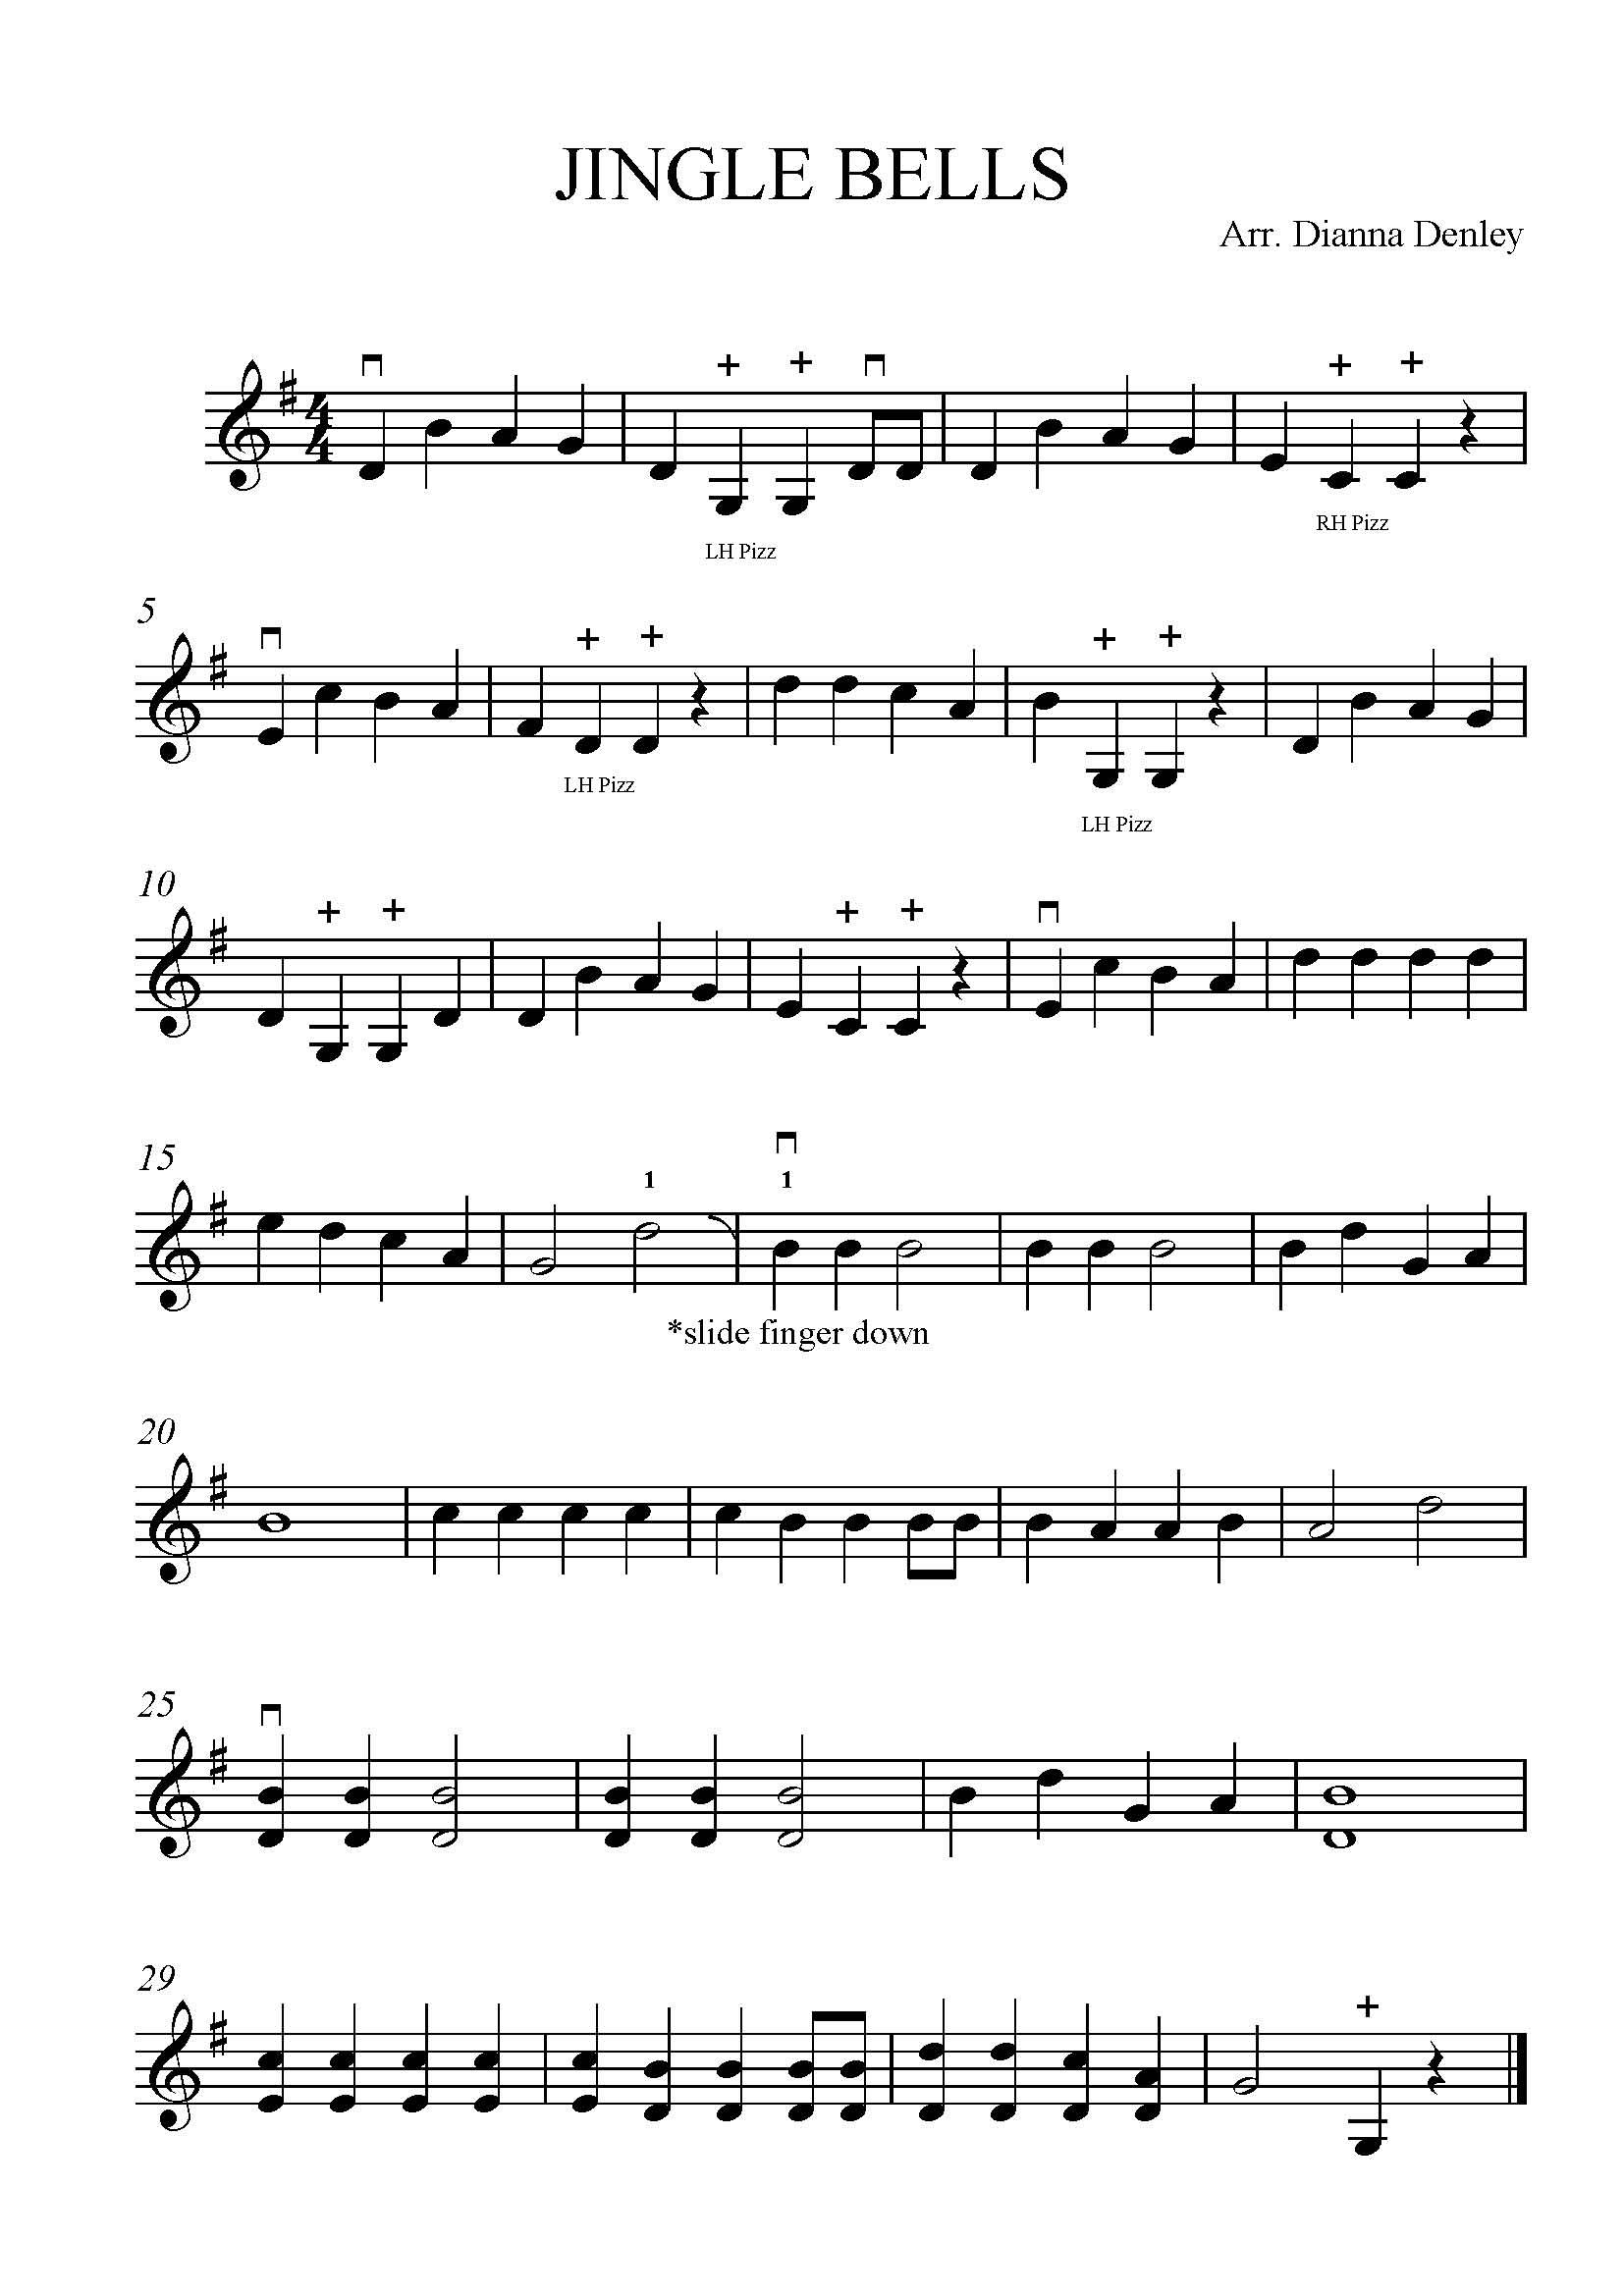 Jingle Bells Sheet Musoc